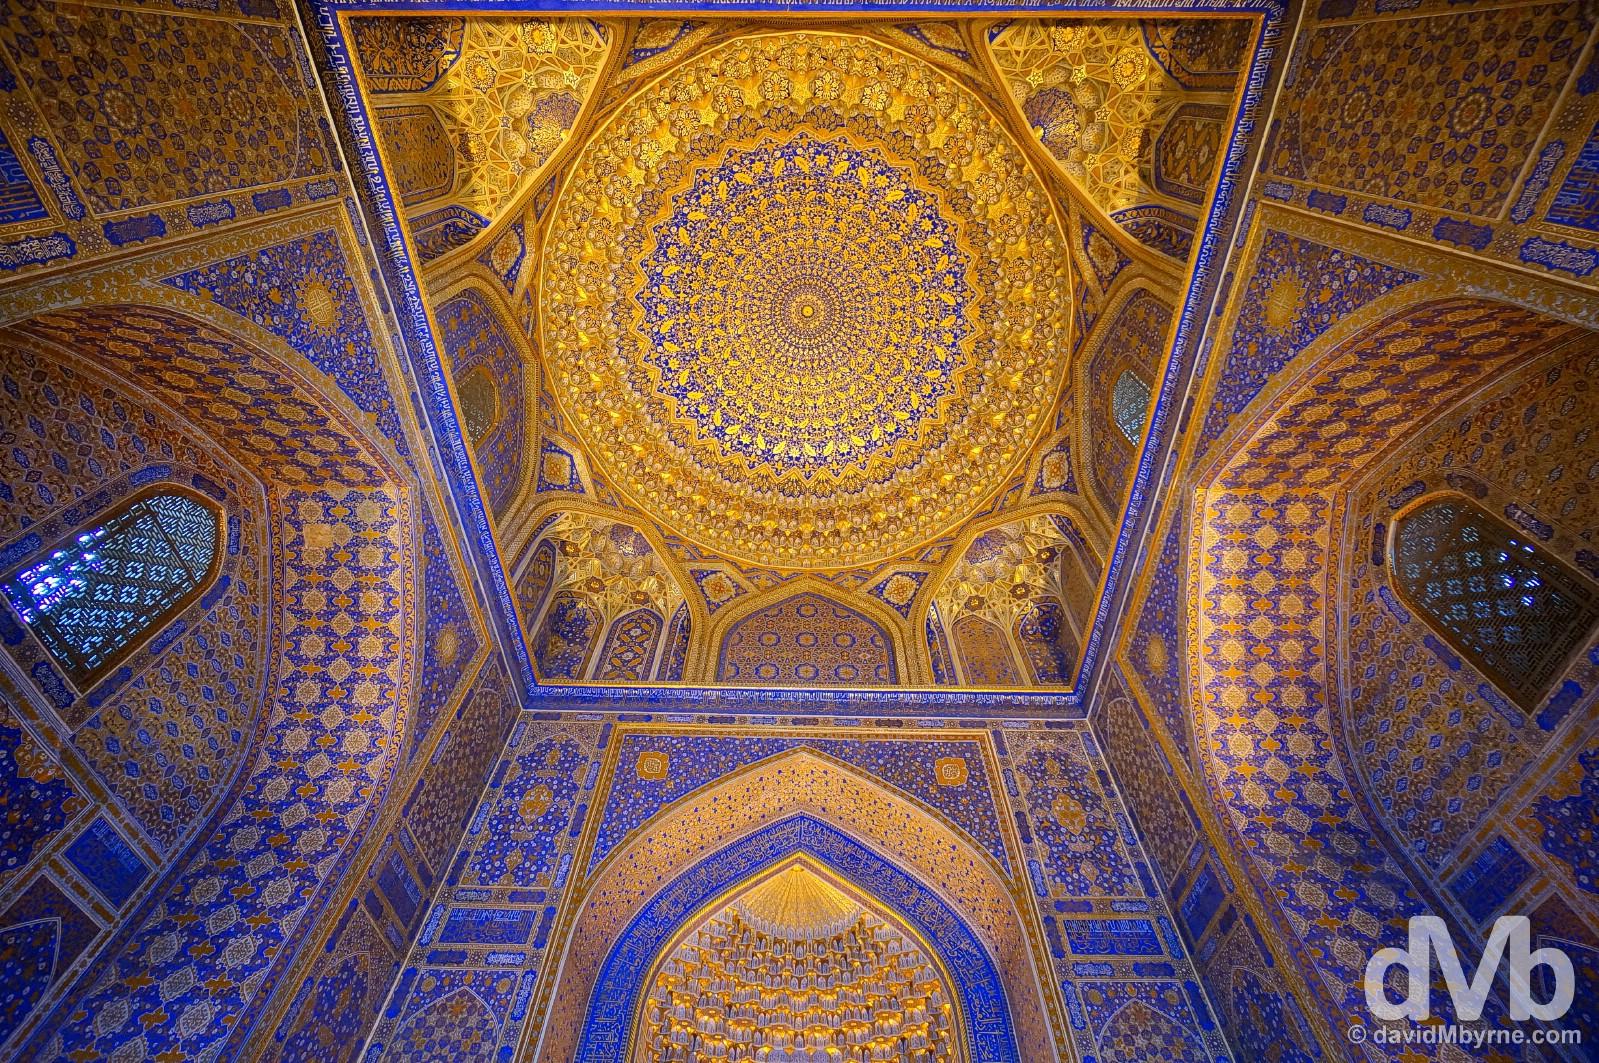 The stunning golf leaf-heavy ceiling of the mosque in the Tilla-Kari Medressa of the Registan in Samarkand, Uzbekistan. March 8, 2015.